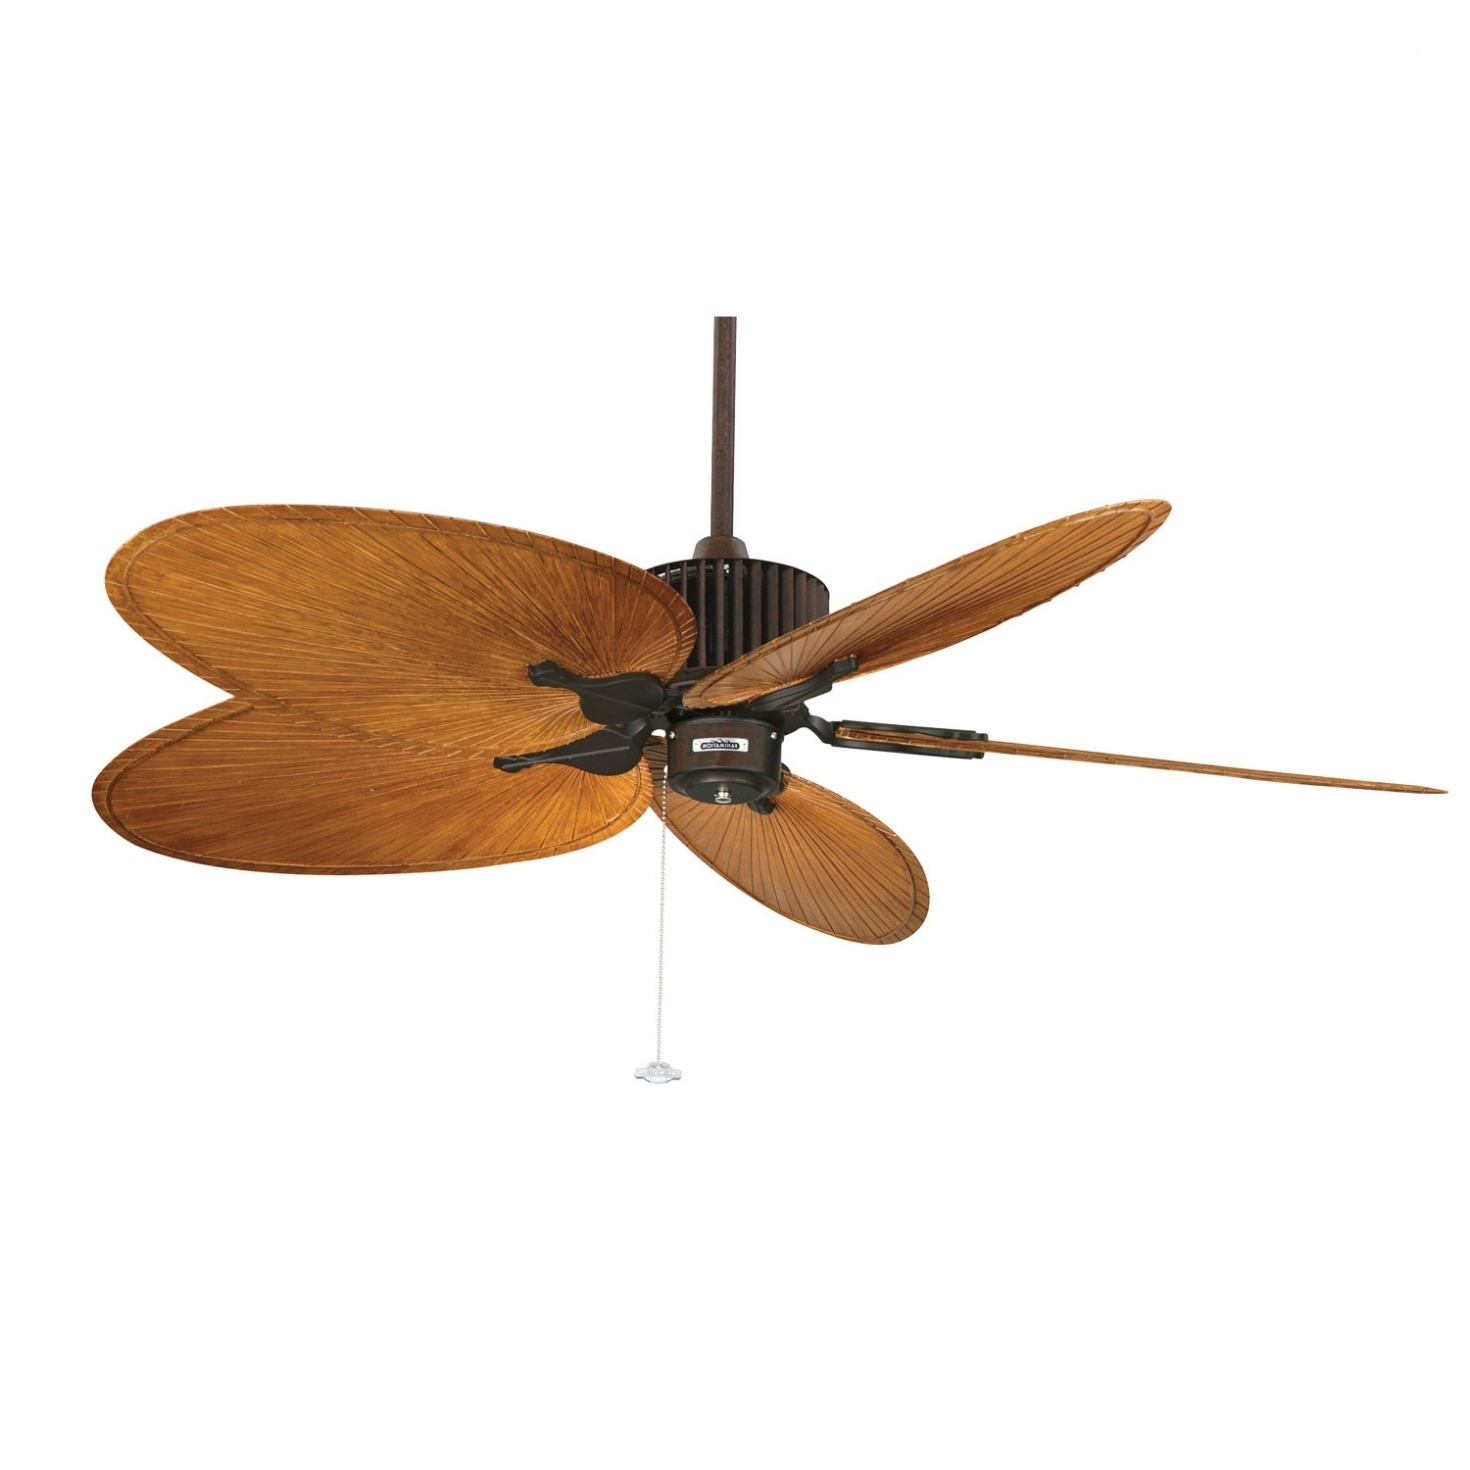 Leaf Blades Outdoor Ceiling Fans Inside 2018 Palm Leaf Ceiling Fan — Foothillfolk Designs (View 14 of 20)